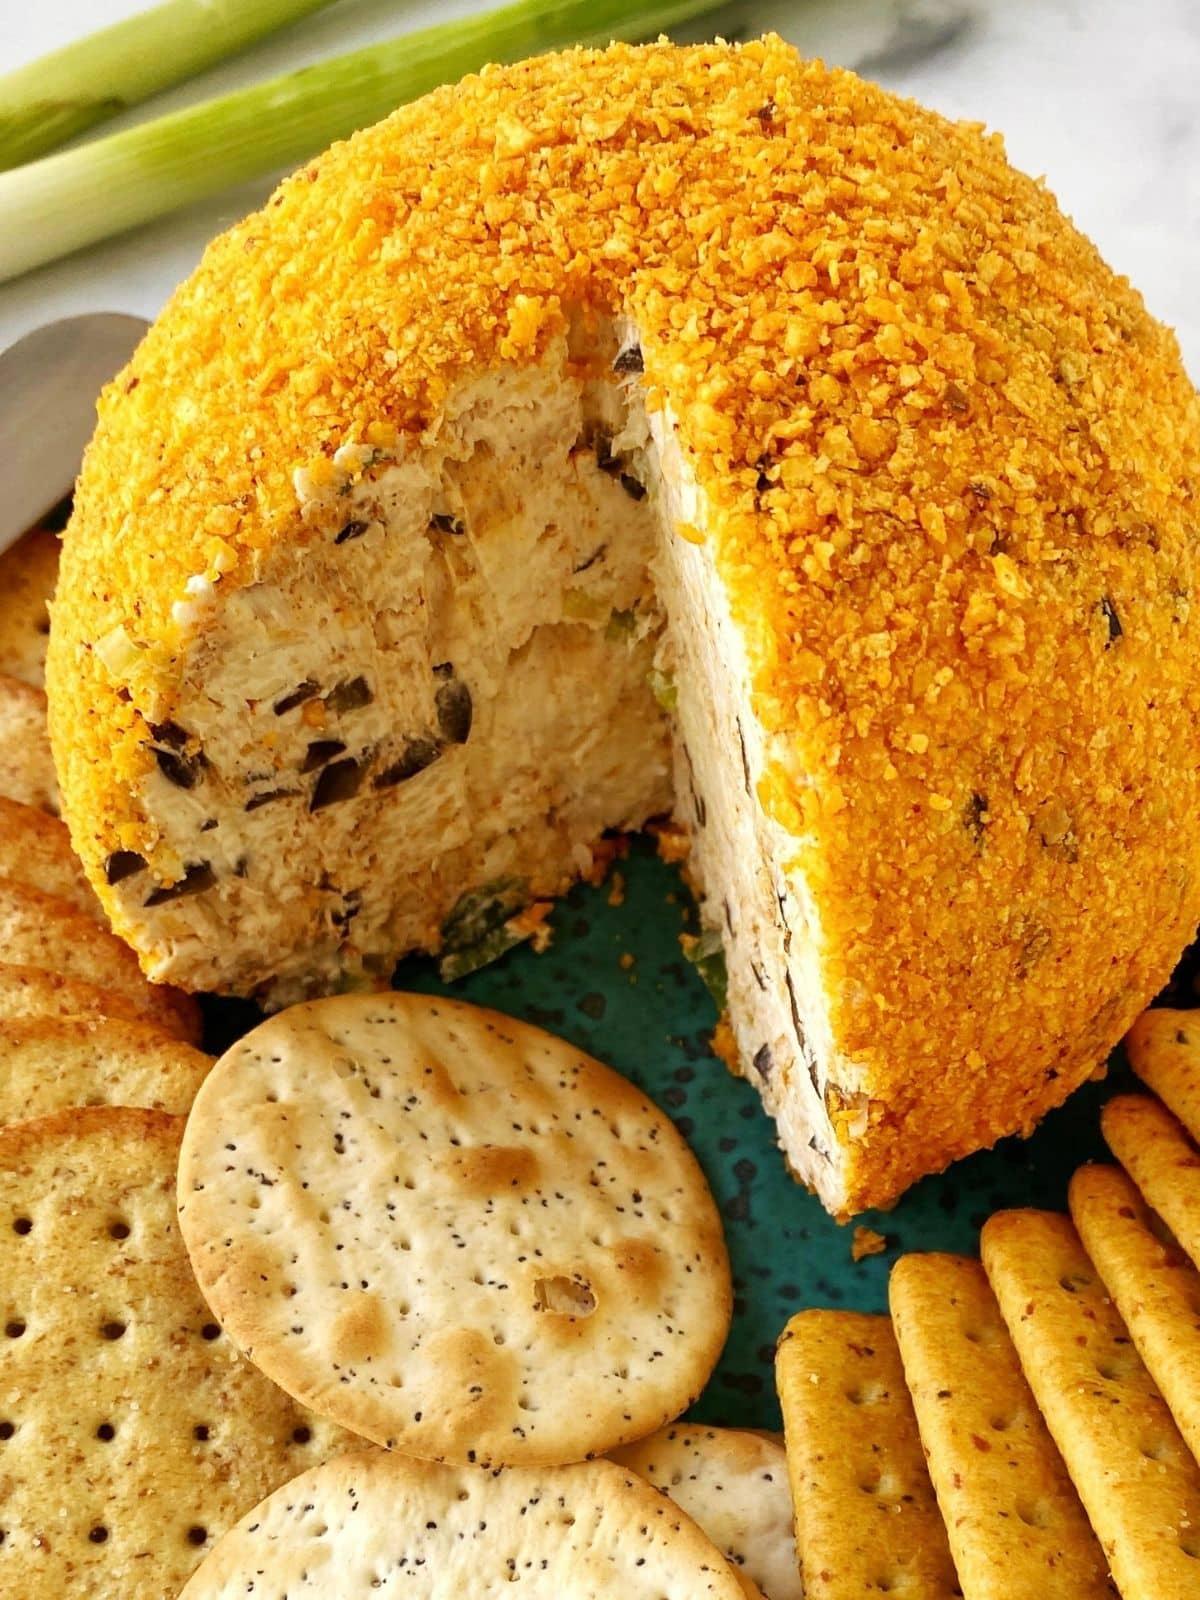 cheeseball with a cut wedge